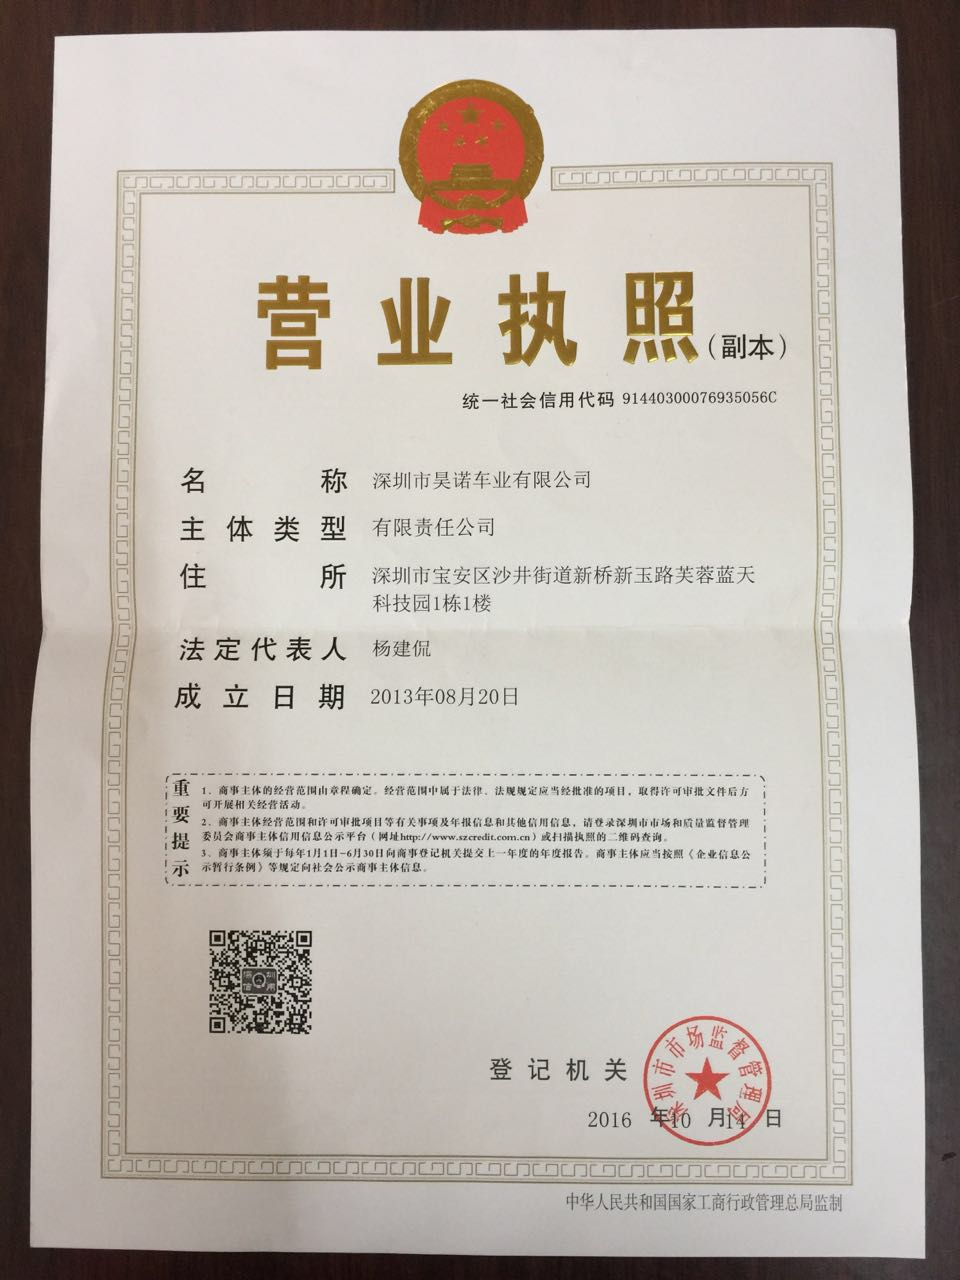 Enterprise Business License